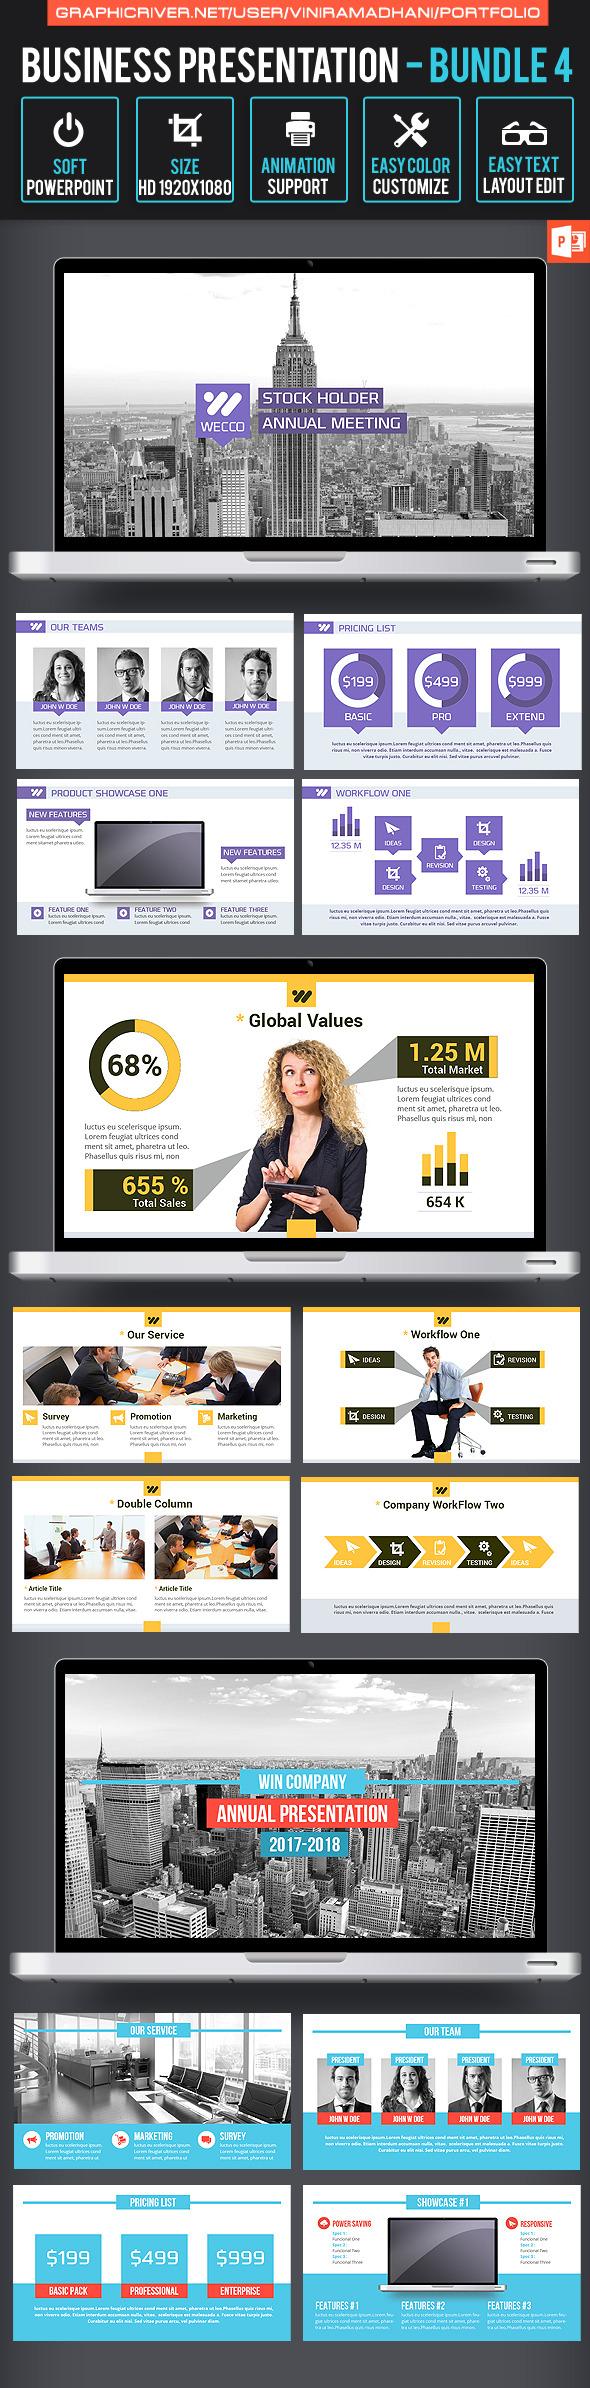 Business Presentation Bundle 4 - Business PowerPoint Templates